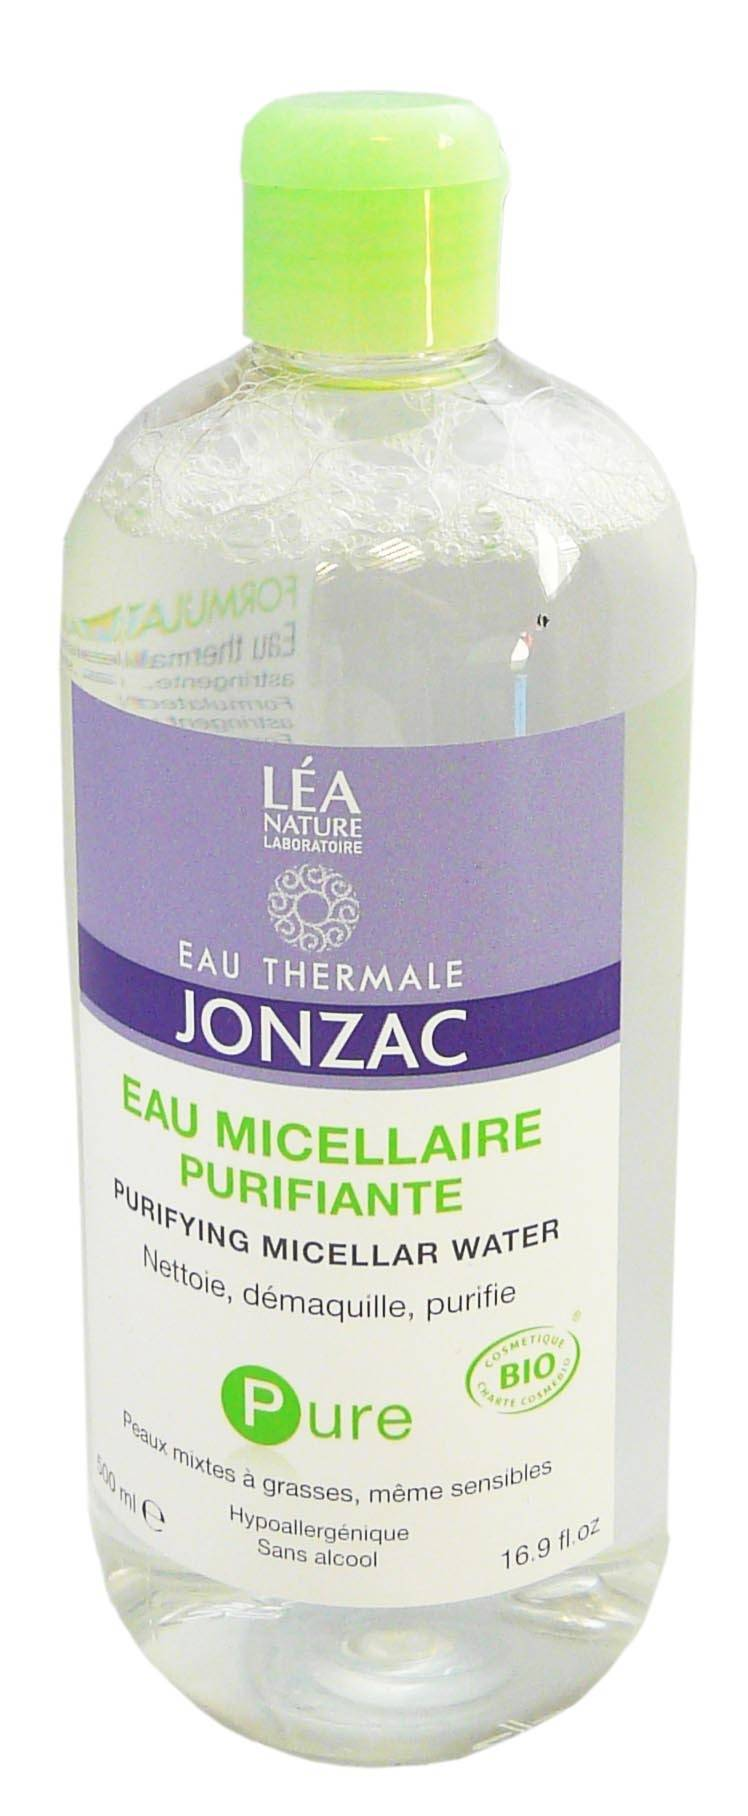 Jonzac eau micellaire purifiante 500ml